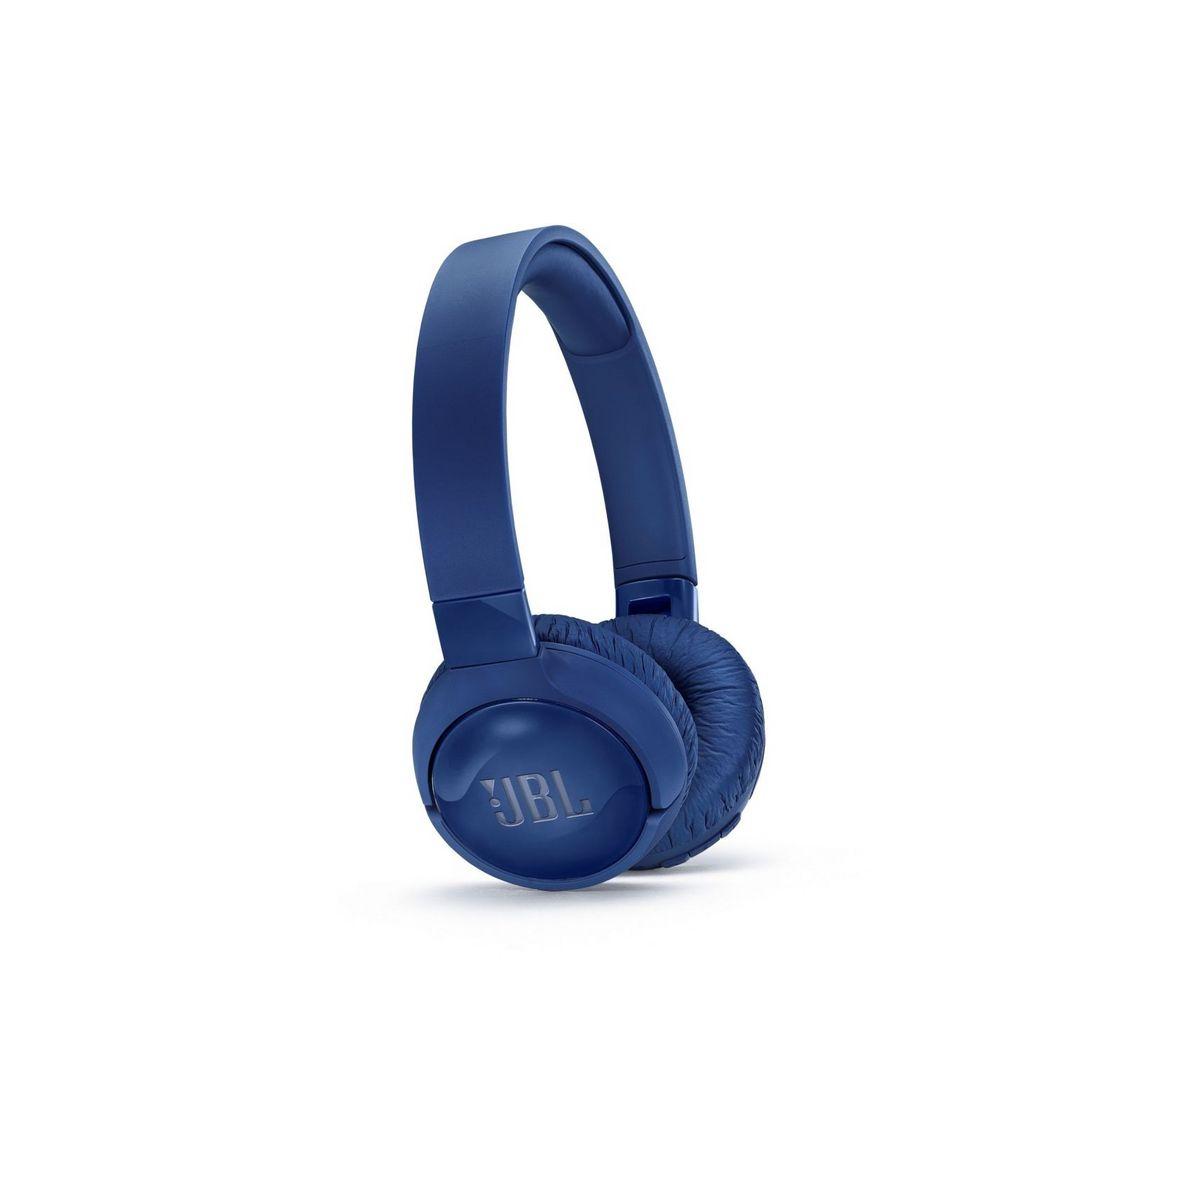 T600 BT NC - Bleu -Casque Audio supra-auriculaire